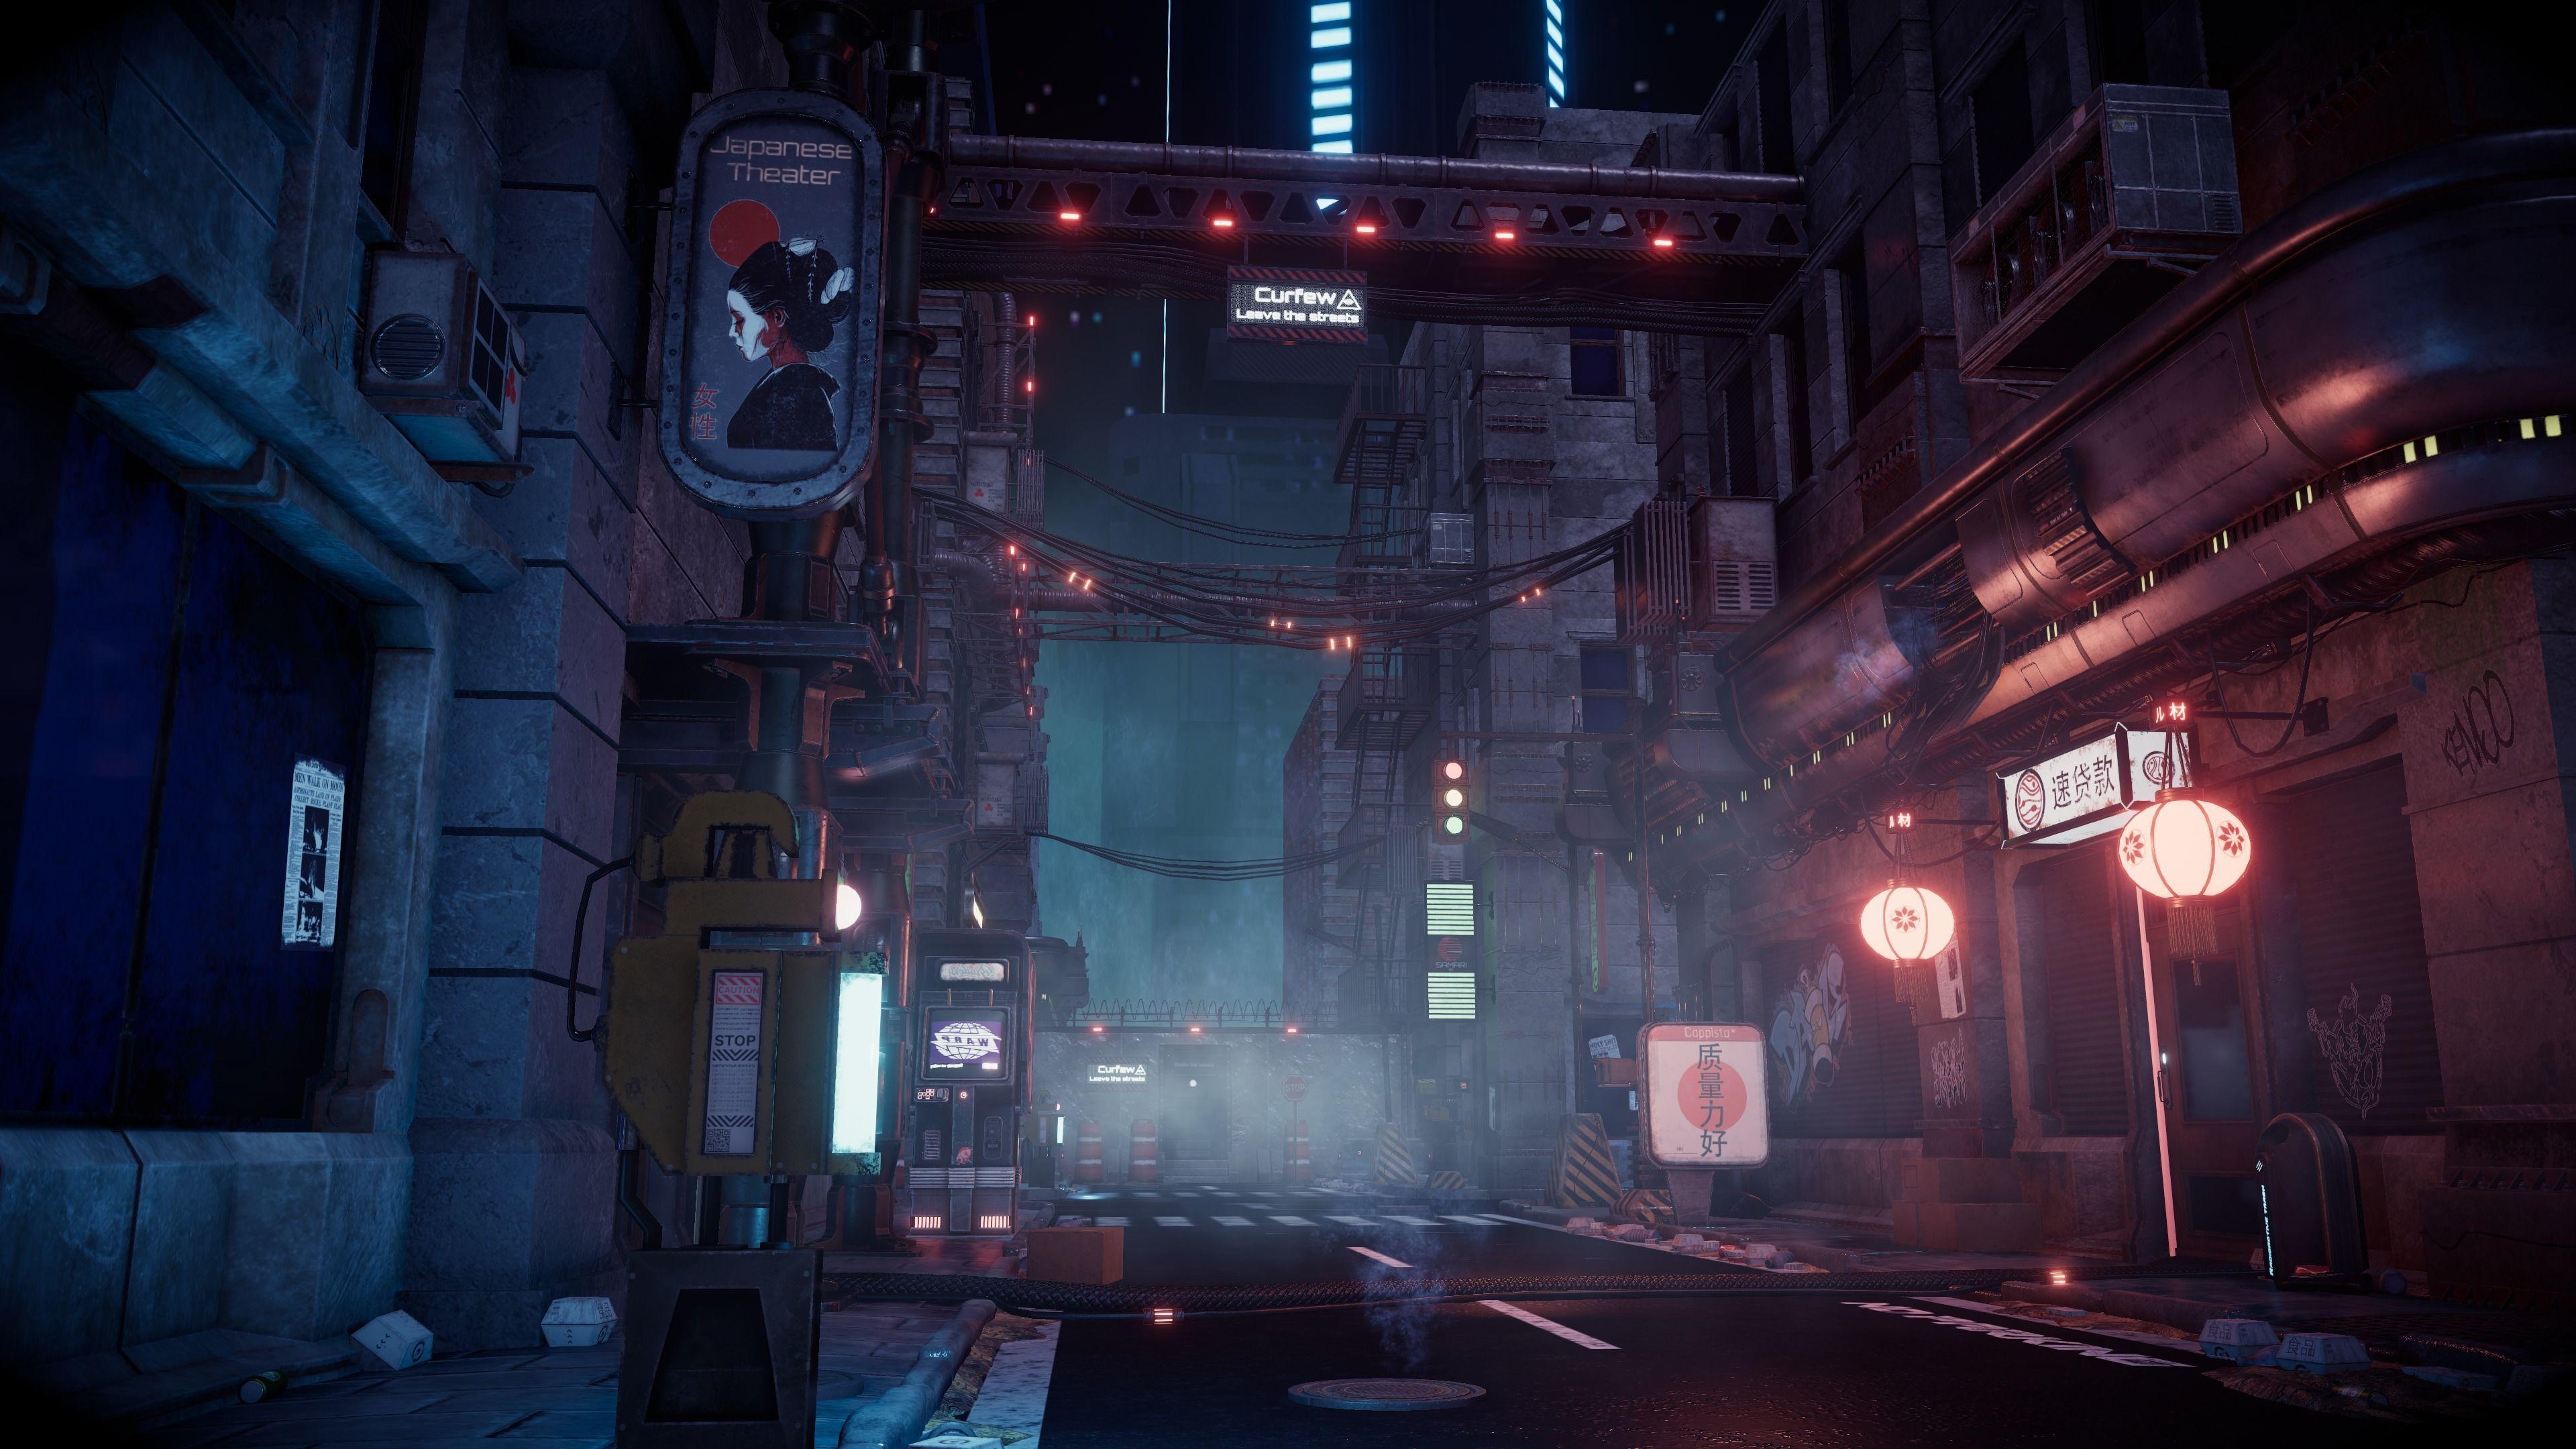 Cyberpunk City Modular Kit Kitbash